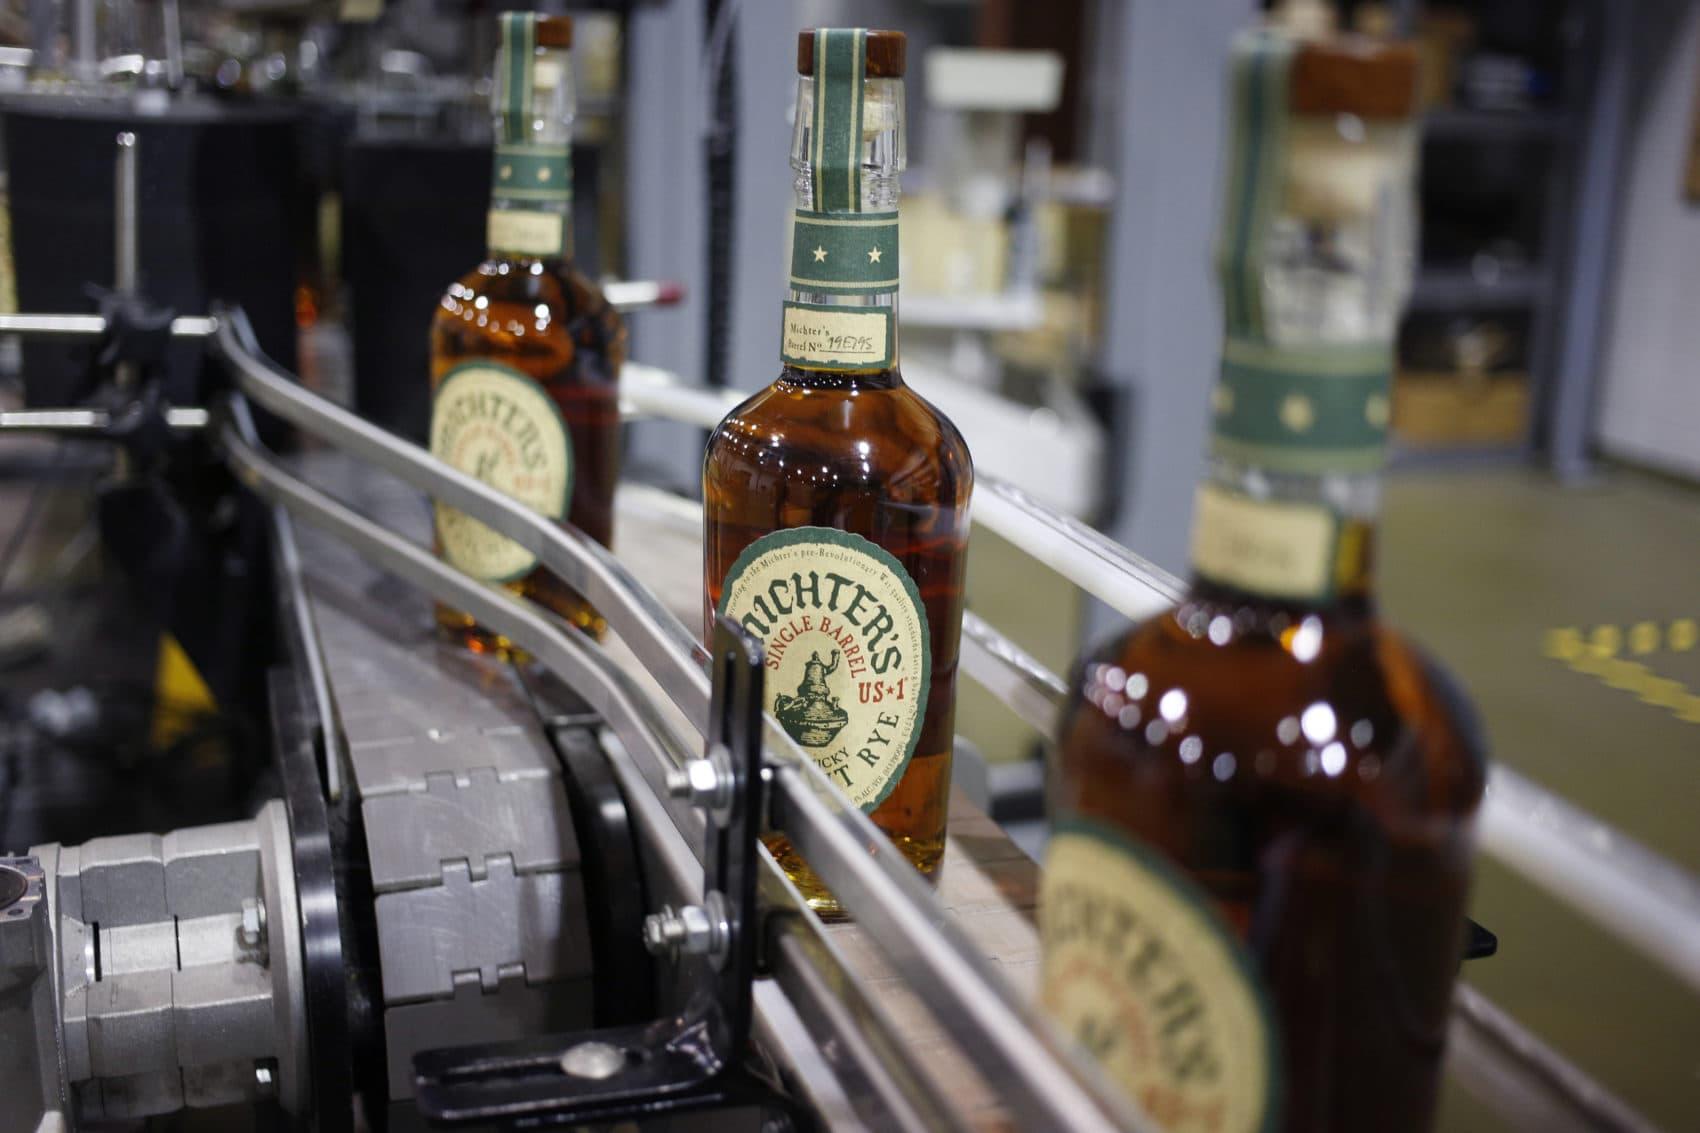 Bottles of Michter's Rye move down a conveyor belt at Michter's Shively Distillery in Louisville, Ky. (Luke Sharrett for Here & Now)